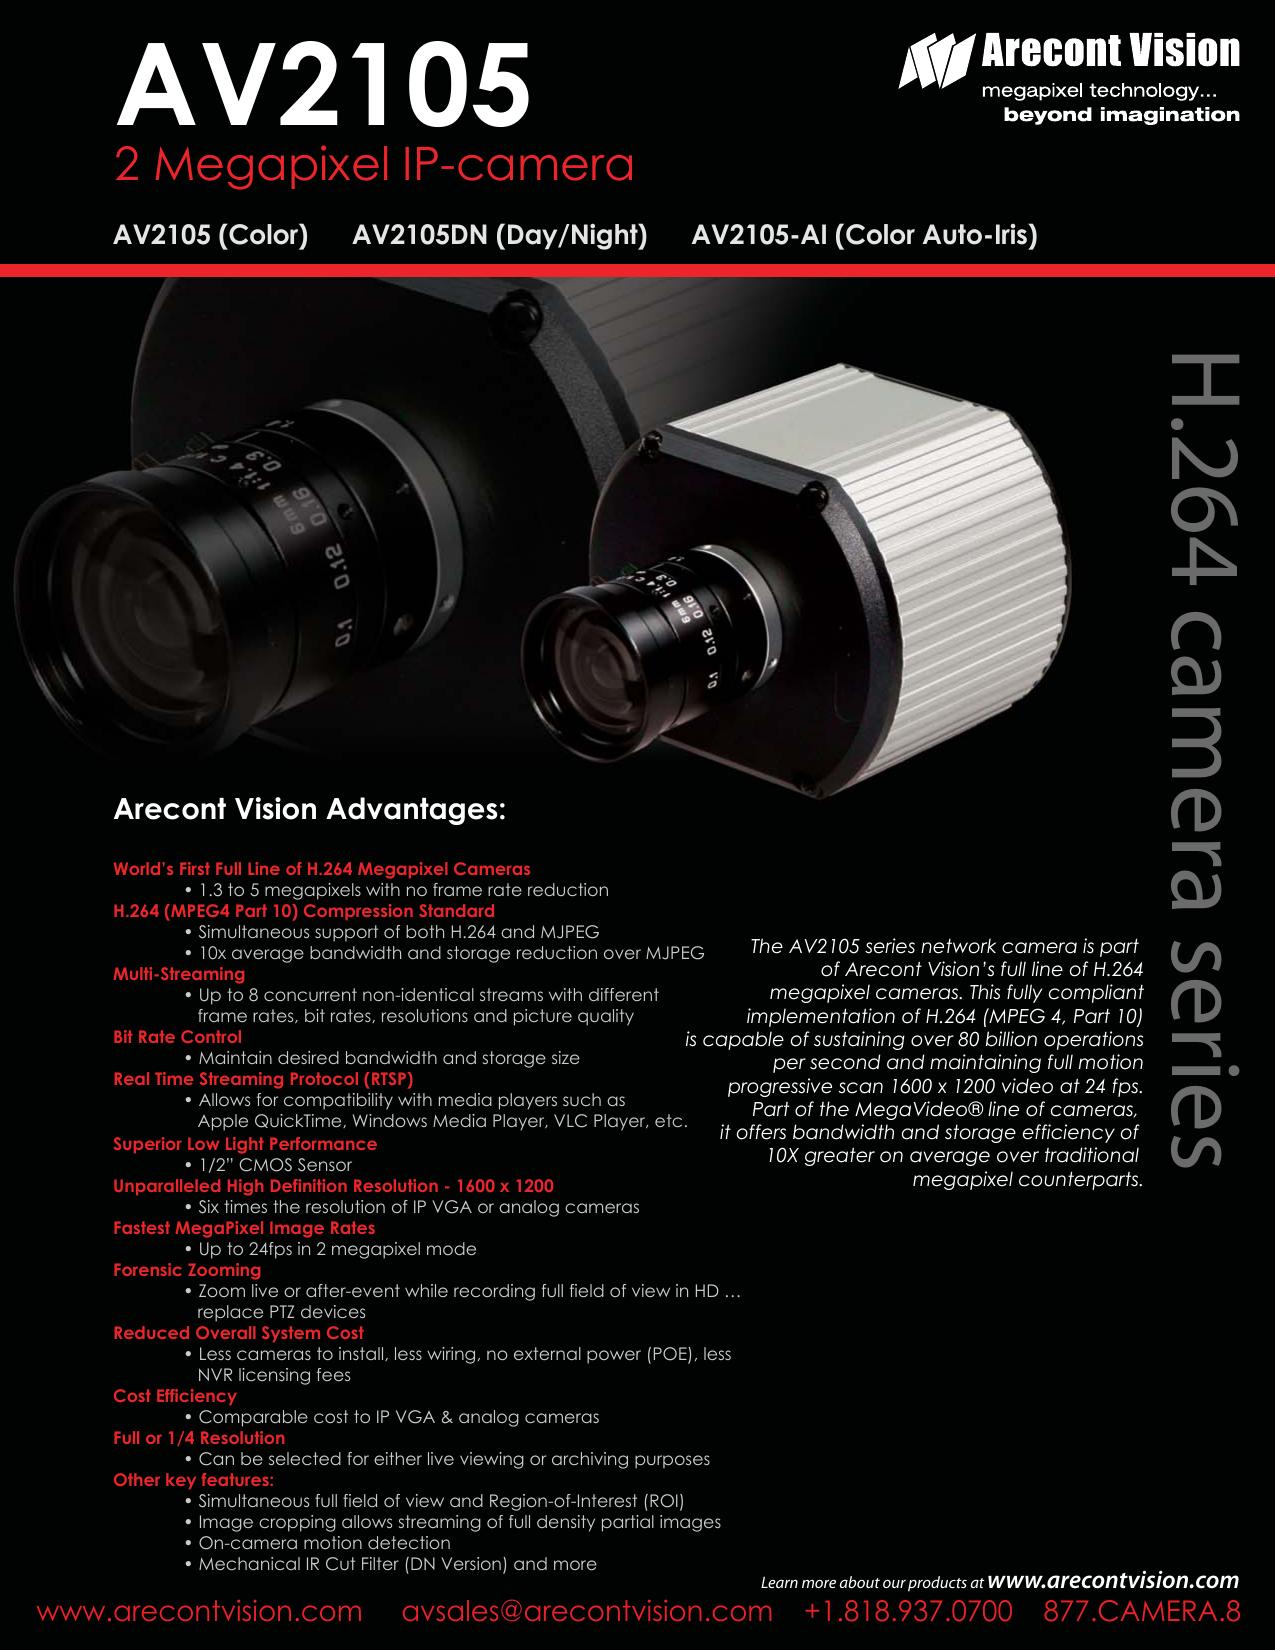 ARECONT VISION AV5105-AI IP CAMERA WINDOWS 8.1 DRIVER